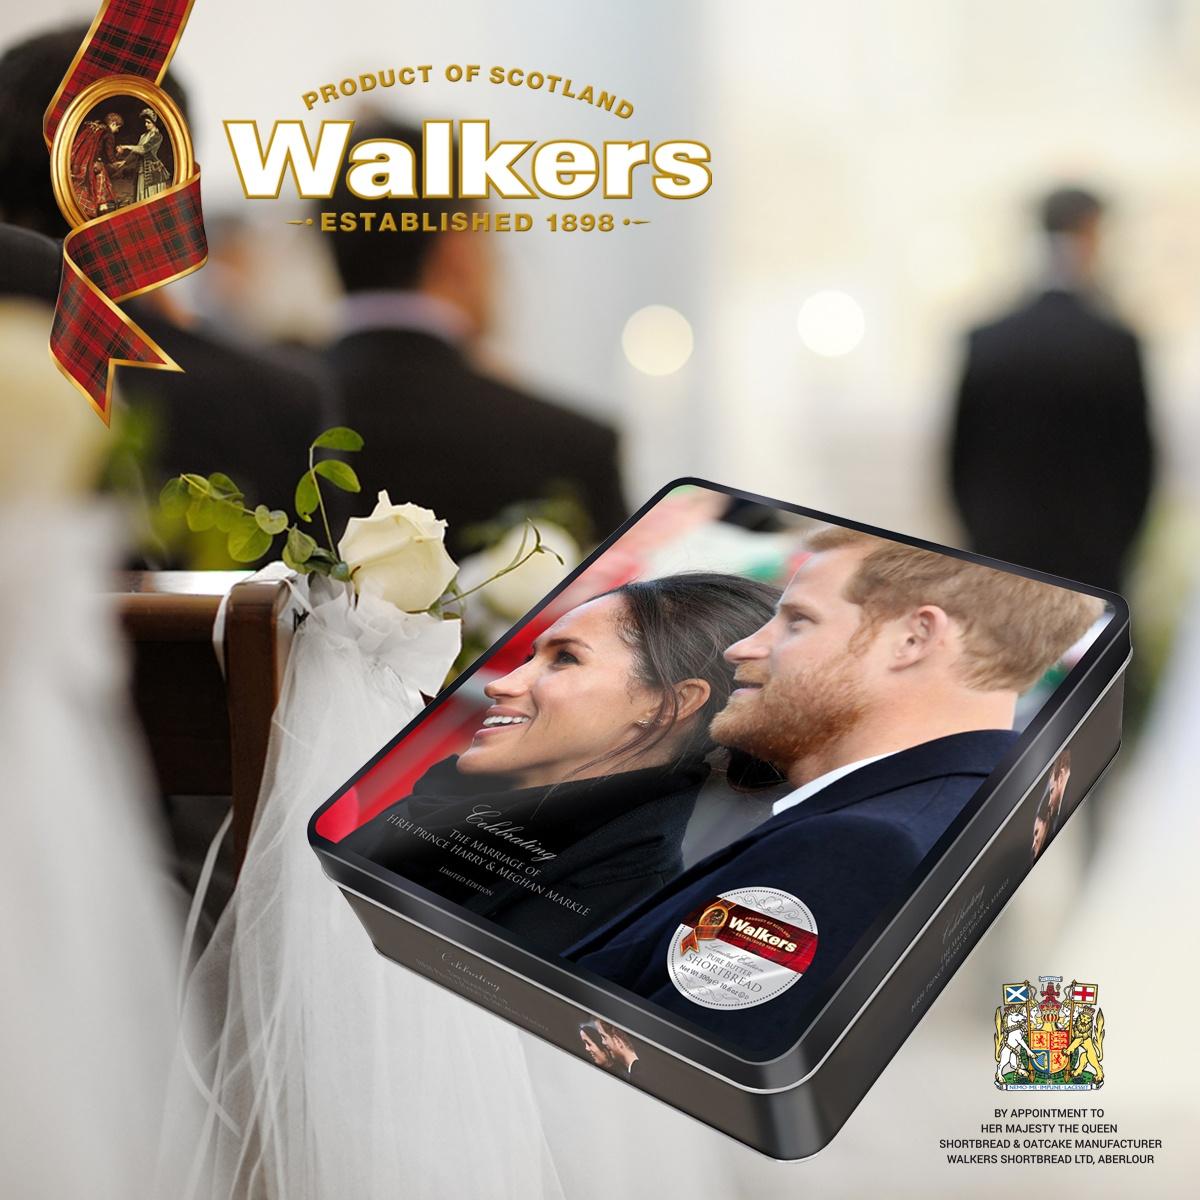 Top Food Feinkost - Walkers Shortbread Royal Wedding Prince Harry und Meghan MarkleTop Food Feinkost - Walkers Shortbread Royal Wedding Prince Harry und Meghan Markle